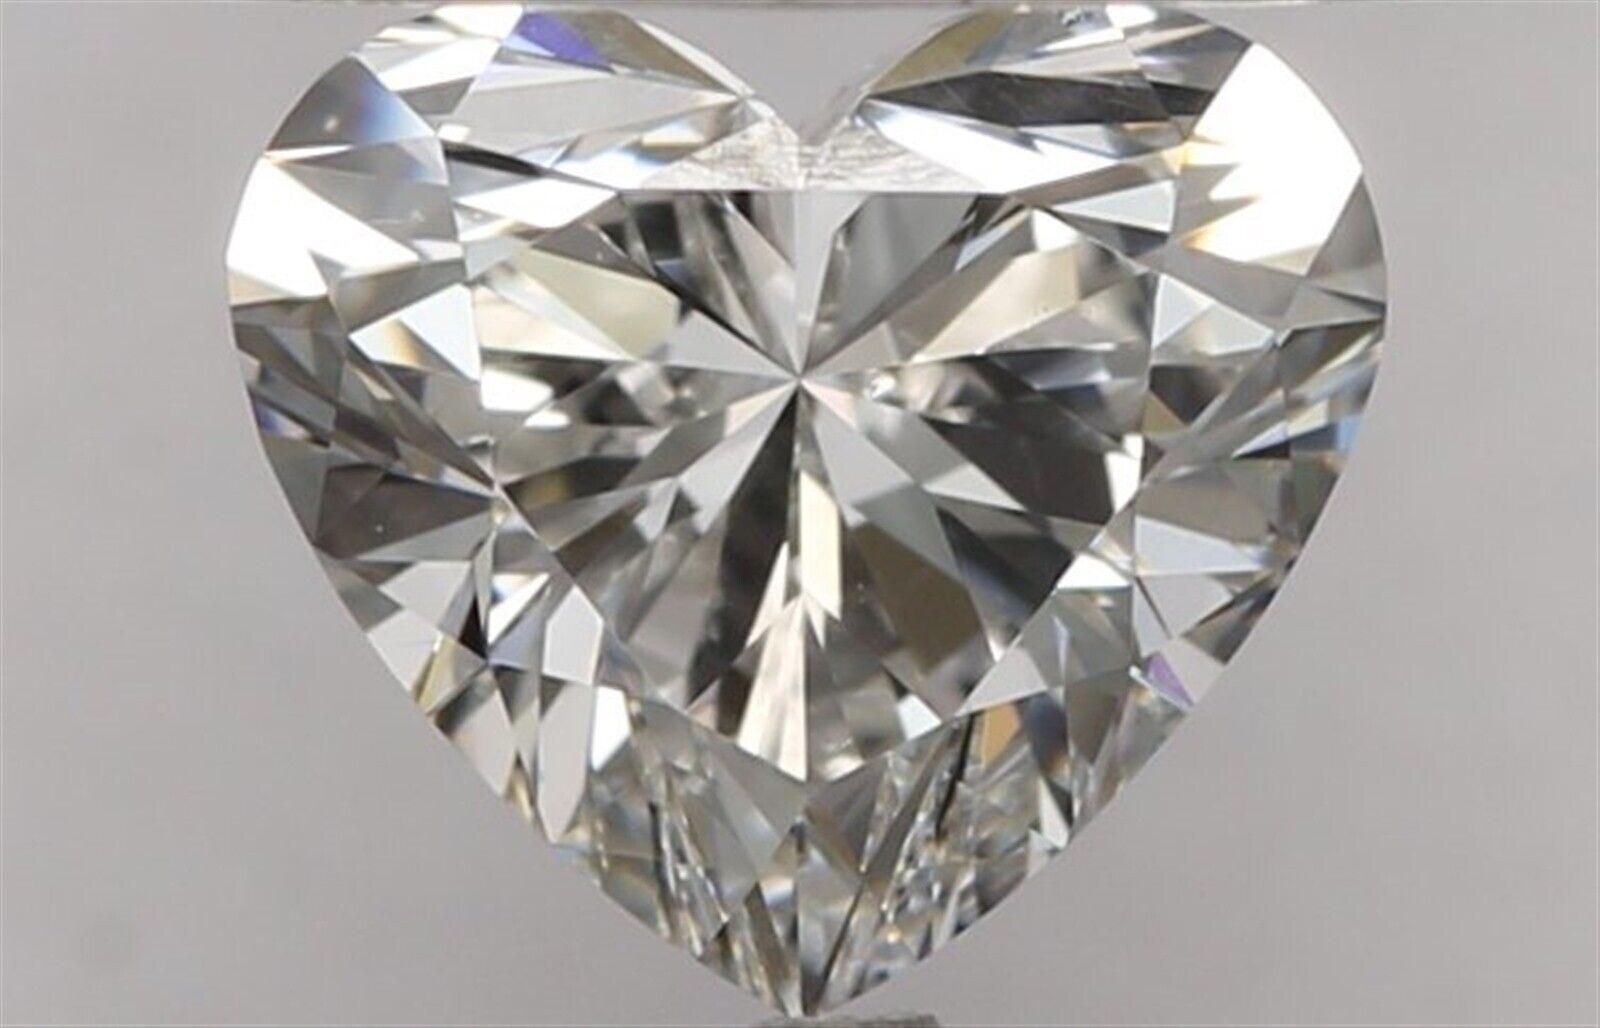 0.91 ct G Color VVS1 Clarity Heart 100% Natural Loose Diamond EX Cut GIA FL None